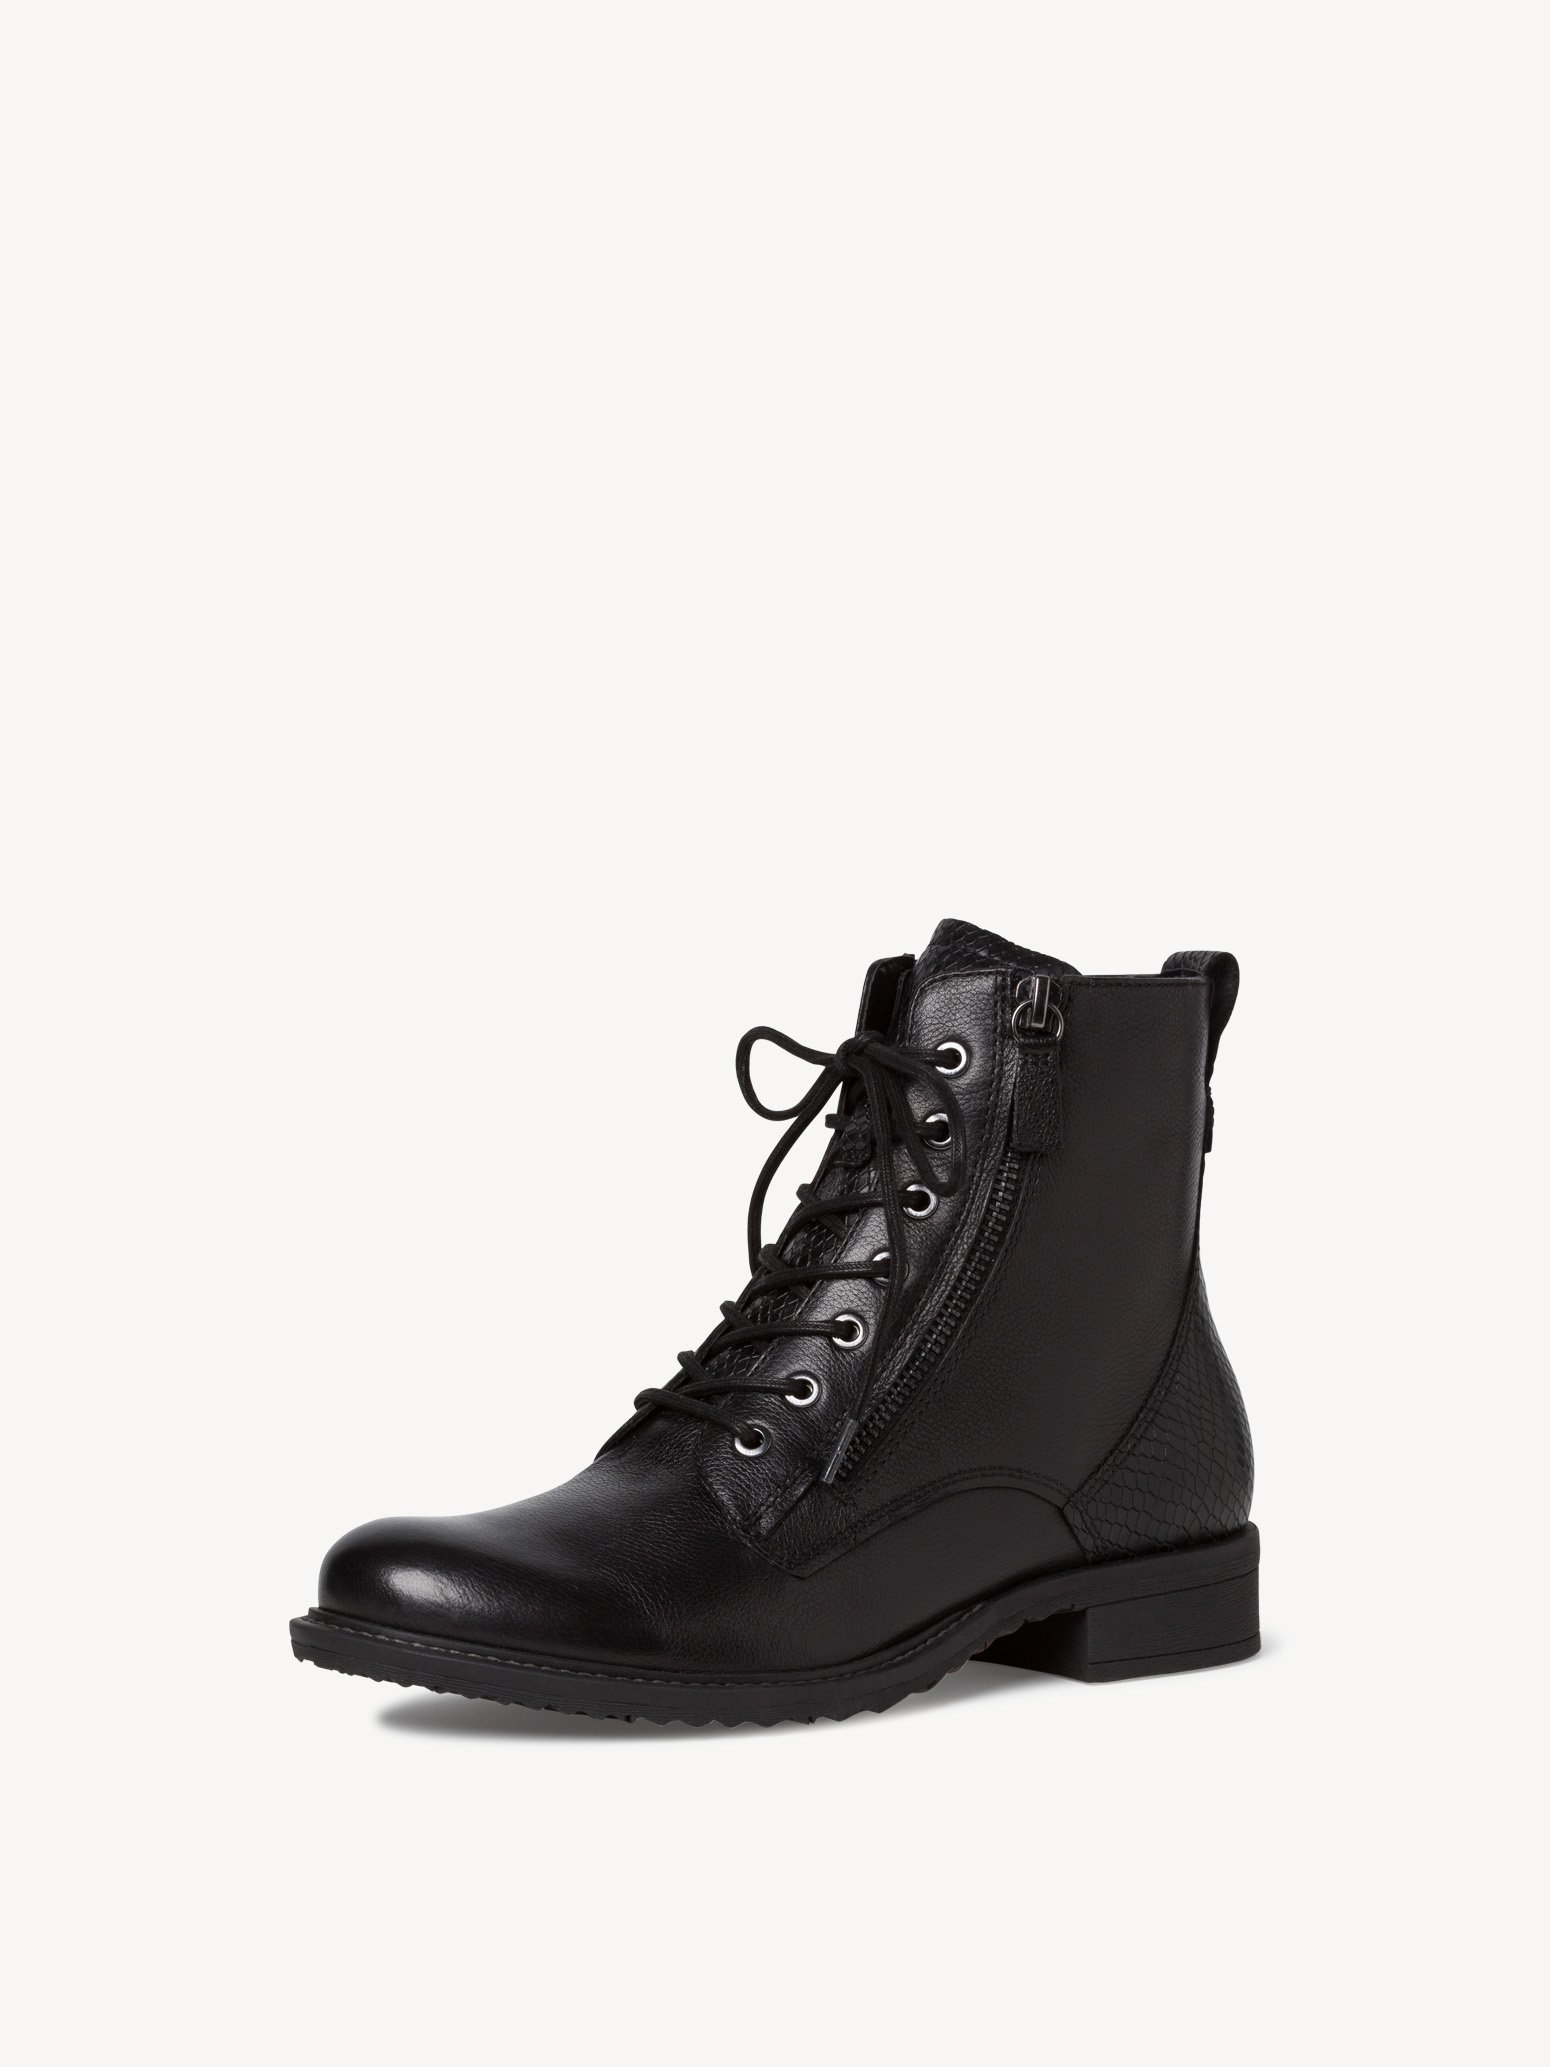 Ботинки Tamaris 1-1-25211-25-015